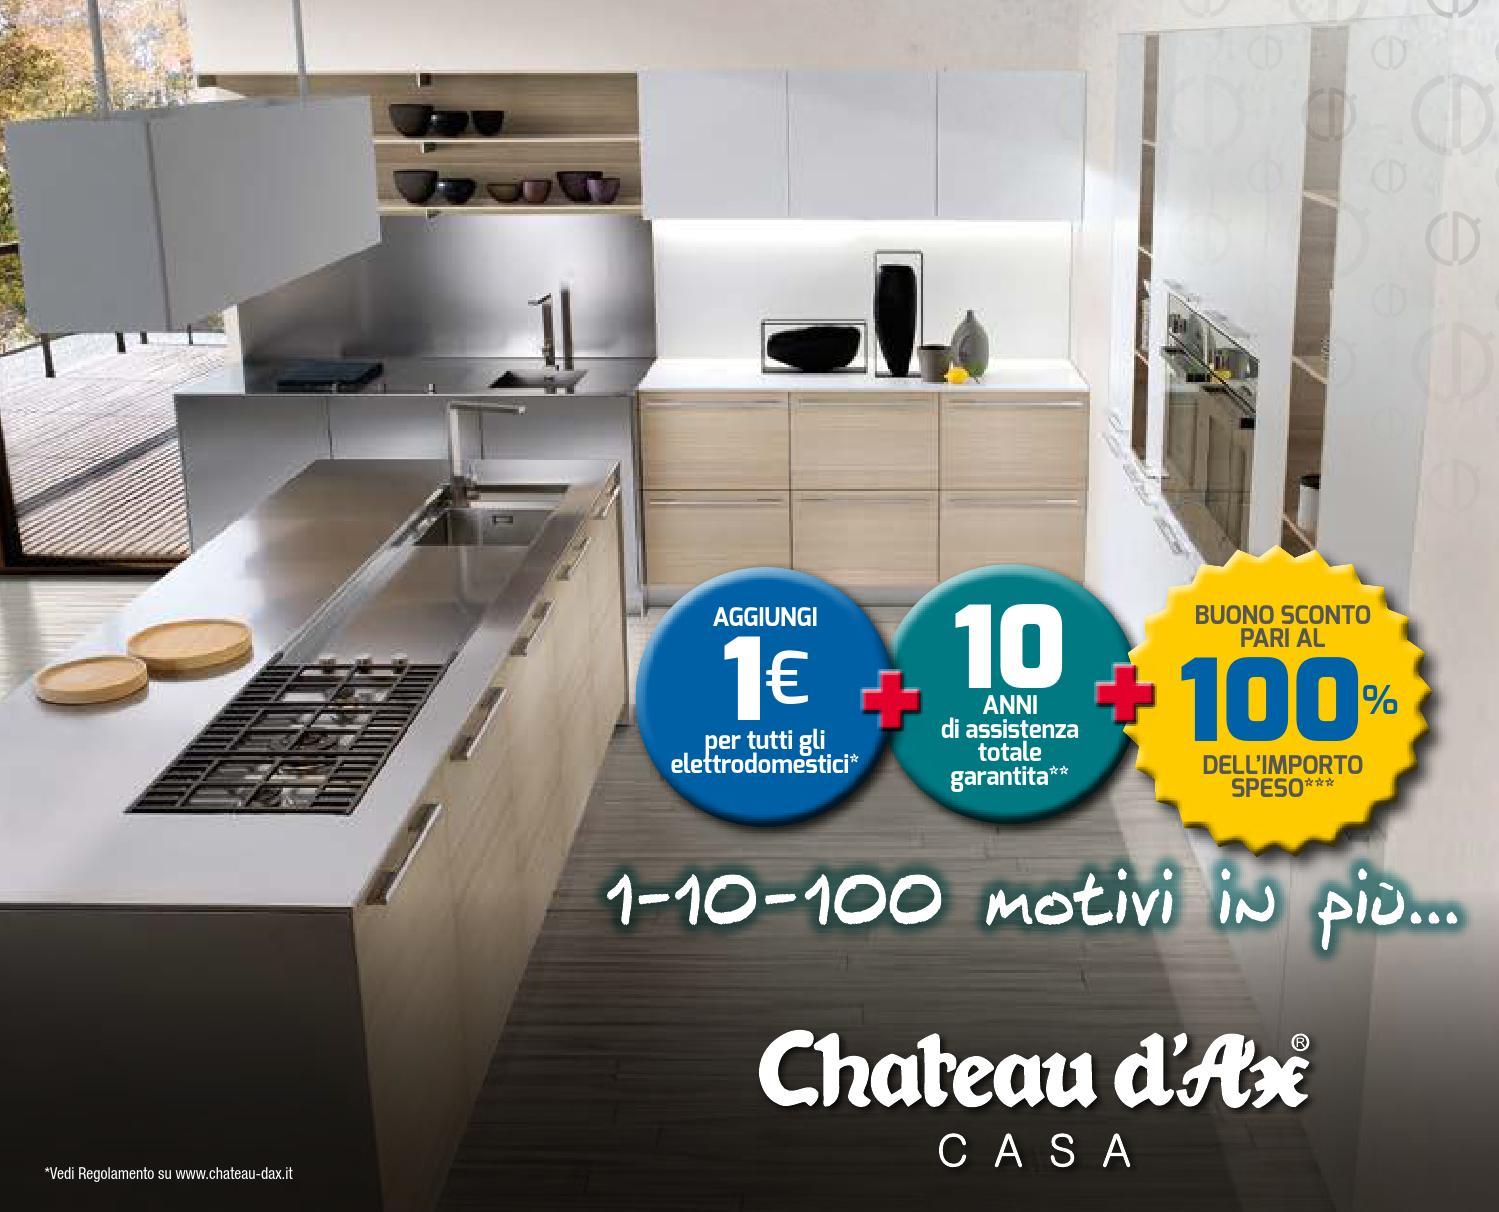 Chateau d 39 ax depliant cucine 2014 by mobilpro issuu - Chateau d ax prezzi cucine ...